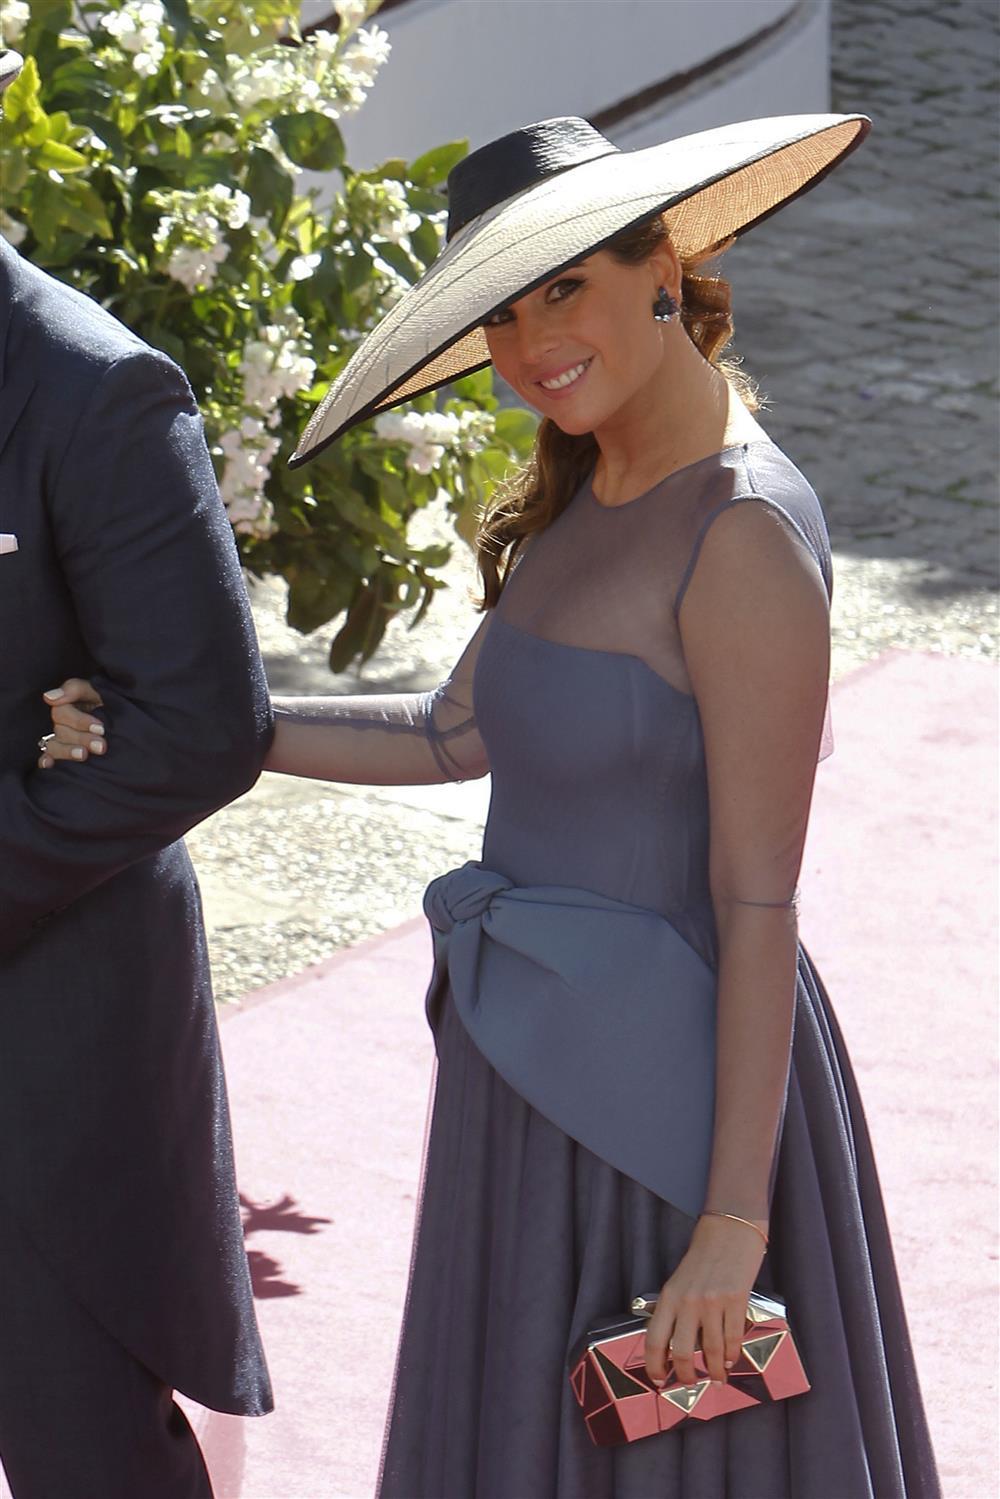 Vestidos cortos de boda famosas